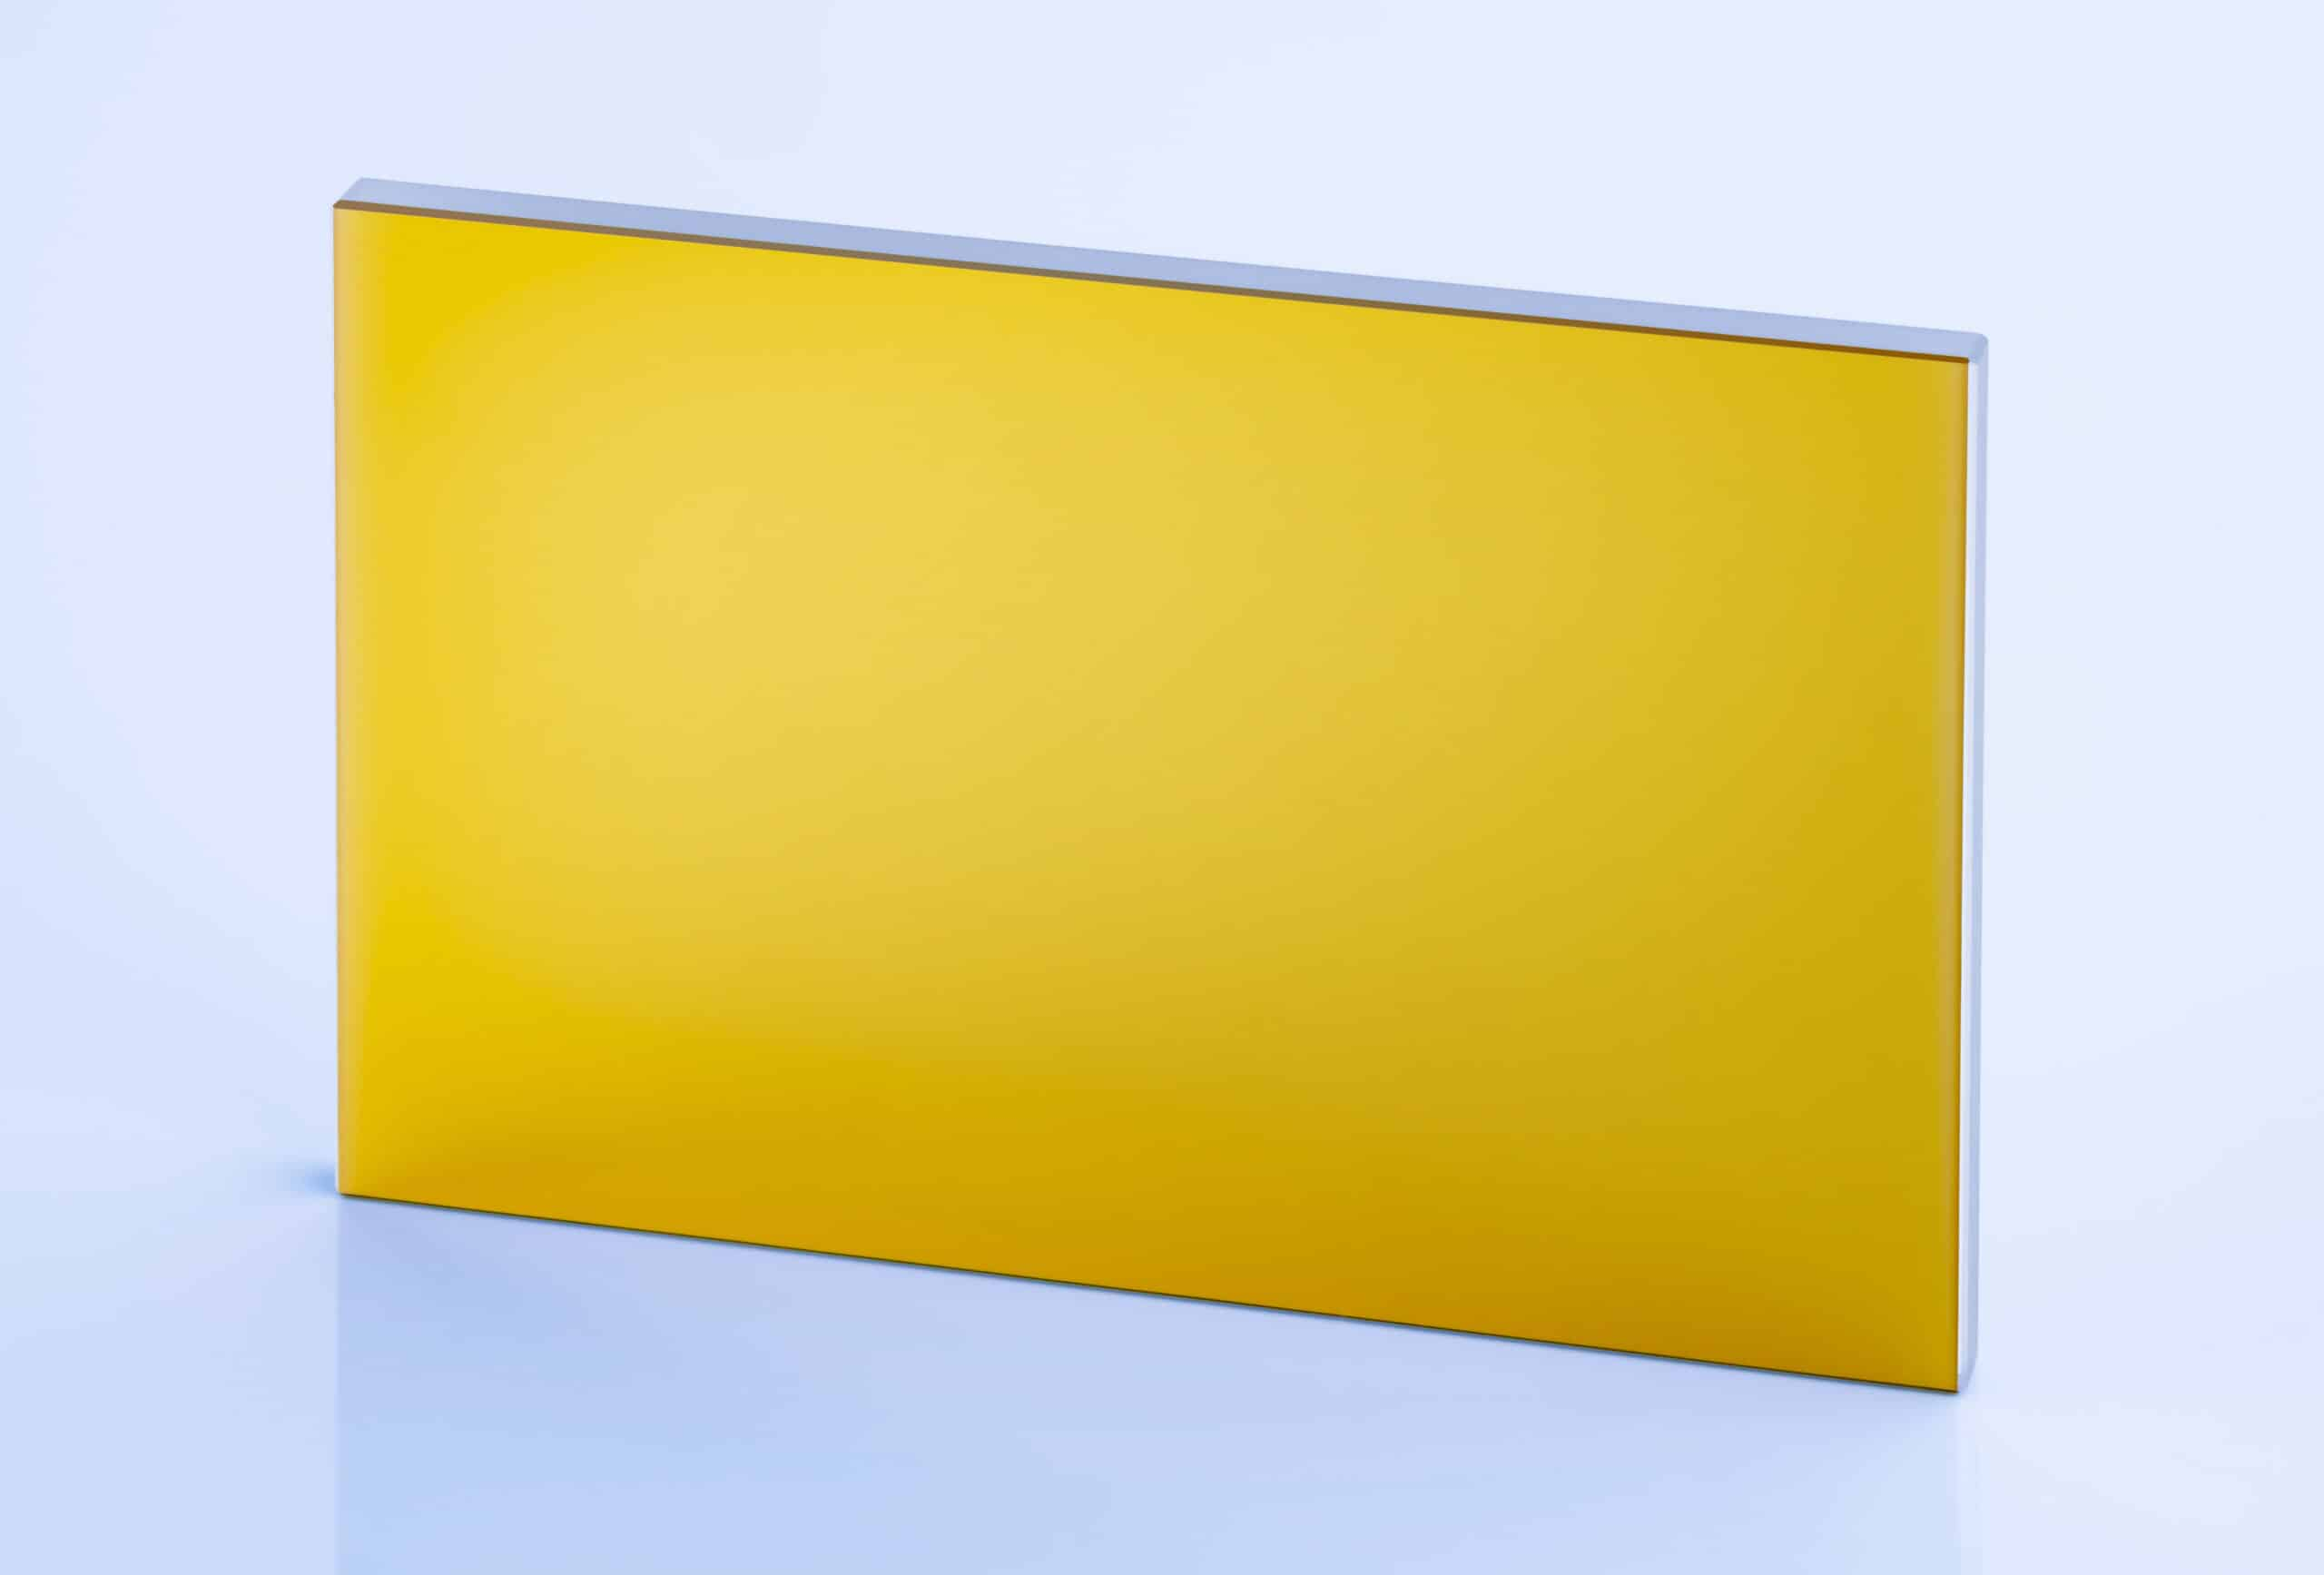 surface mirror